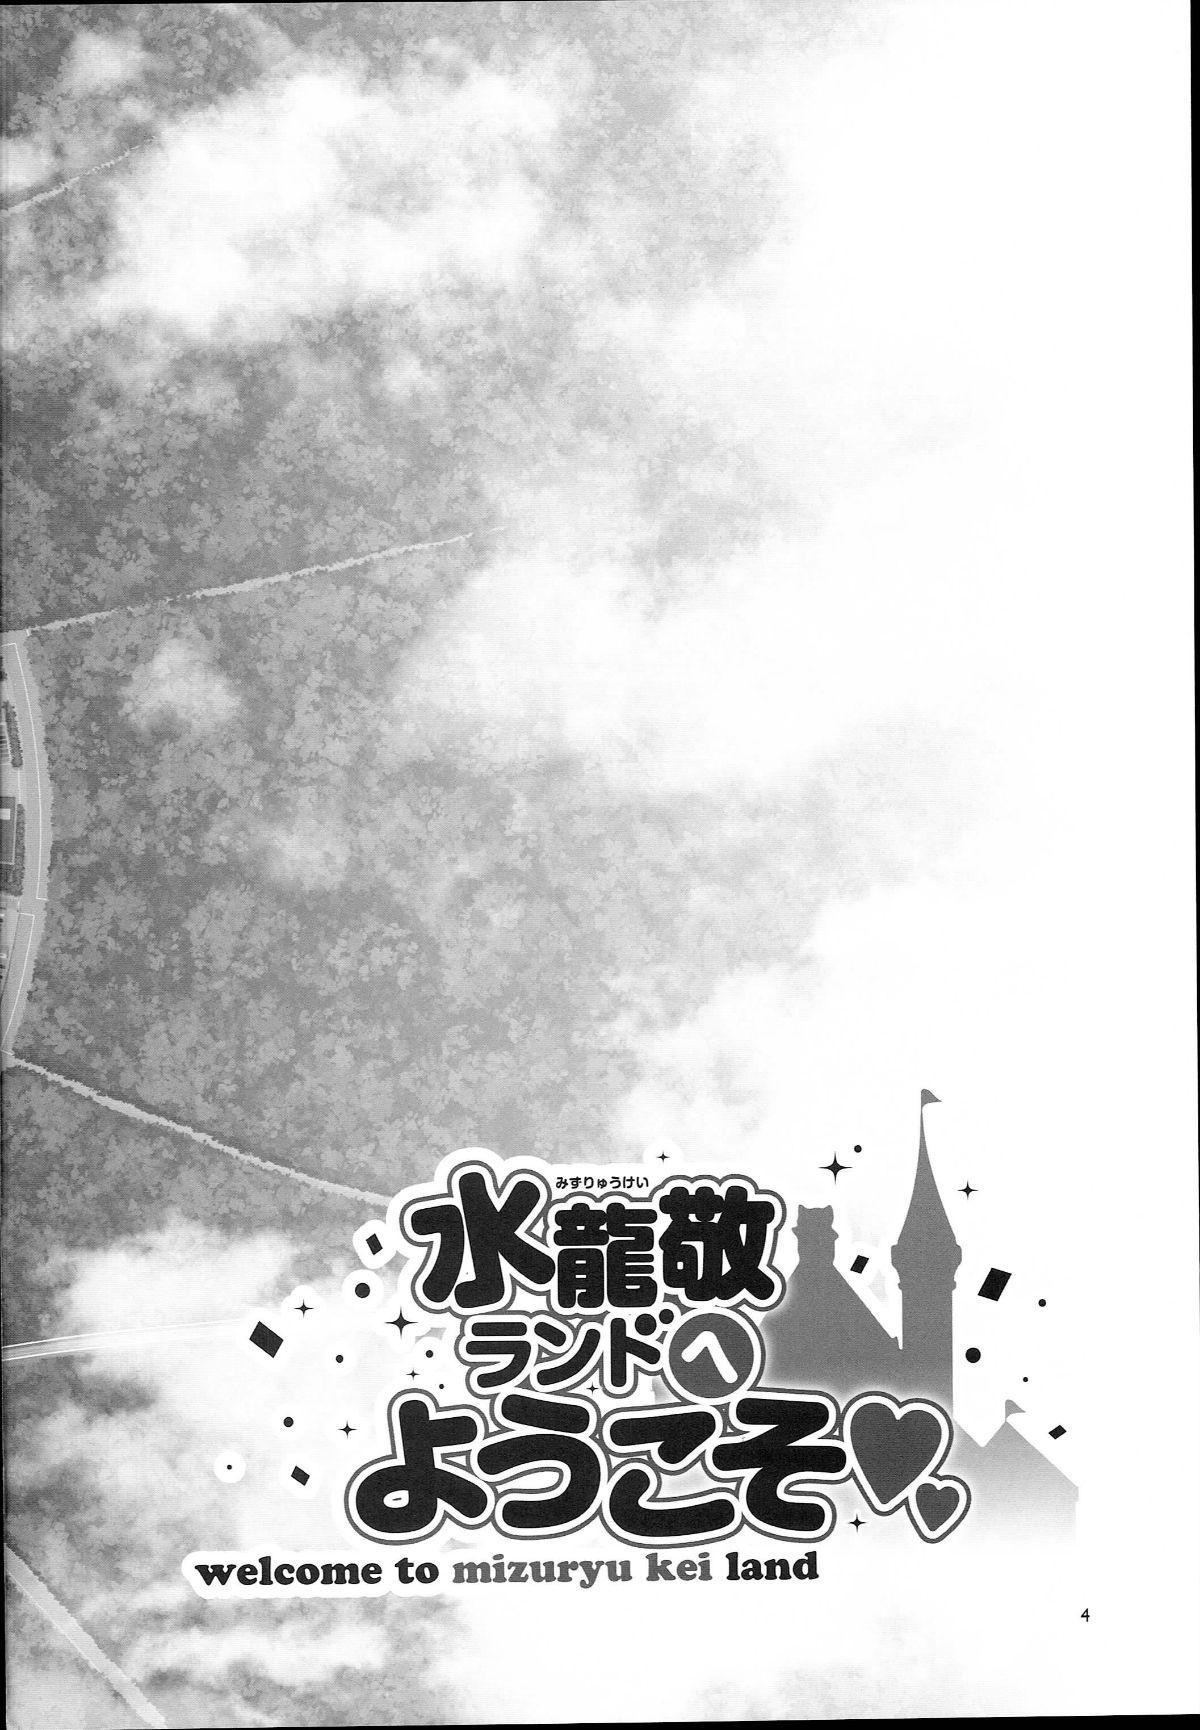 Oideyo! Mizuryu Kei Land the 7th day 3